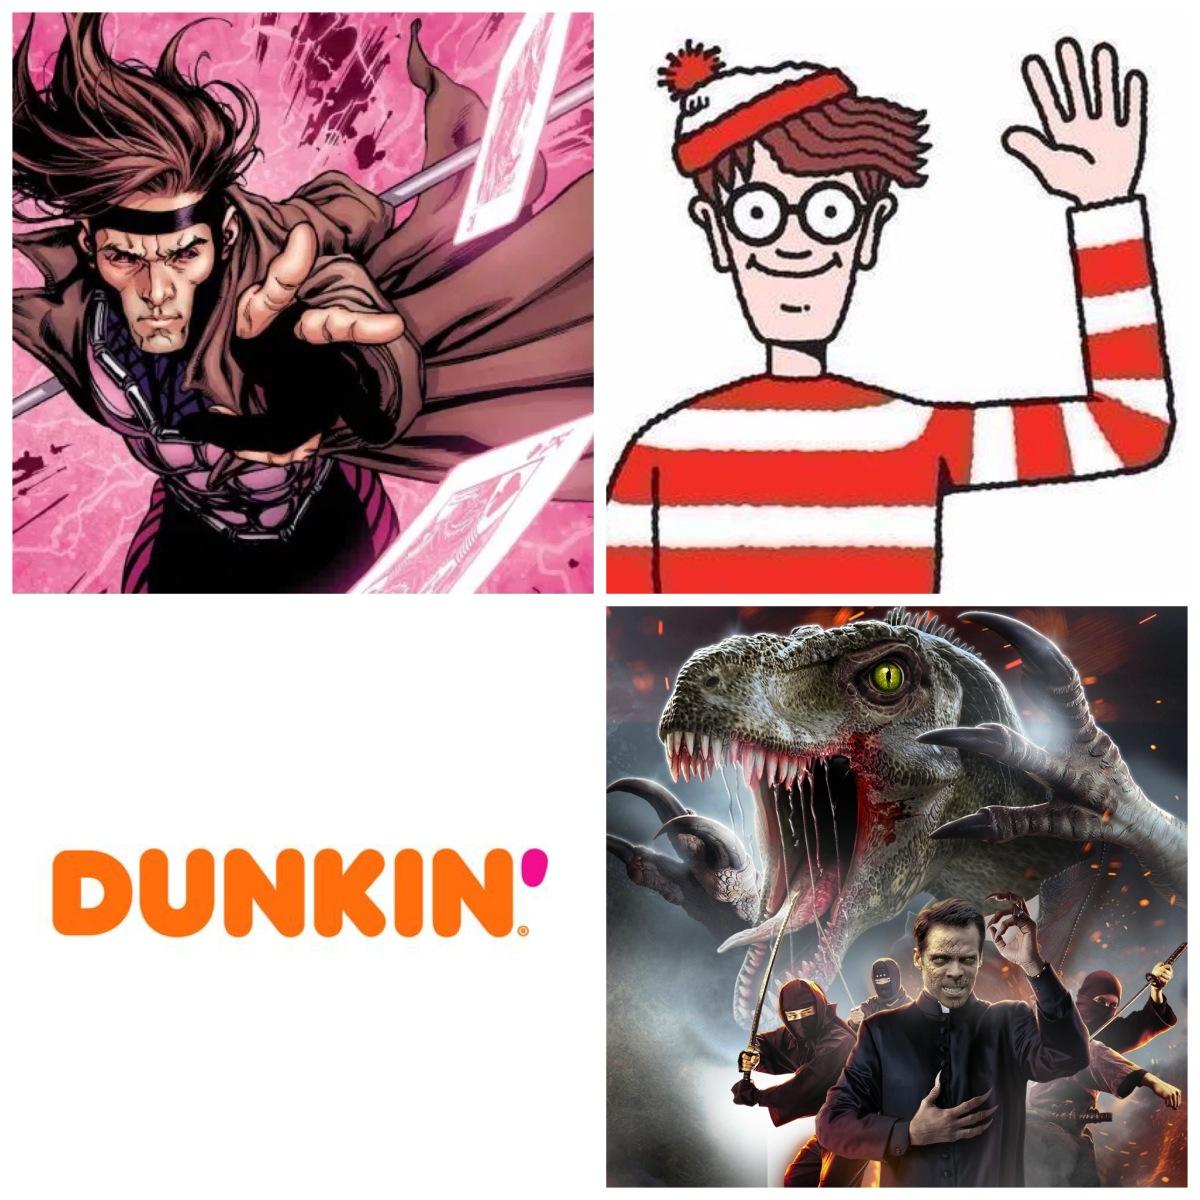 Gambit, Where's Waldo, Dunkin' Donuts, and The VelociPastor.